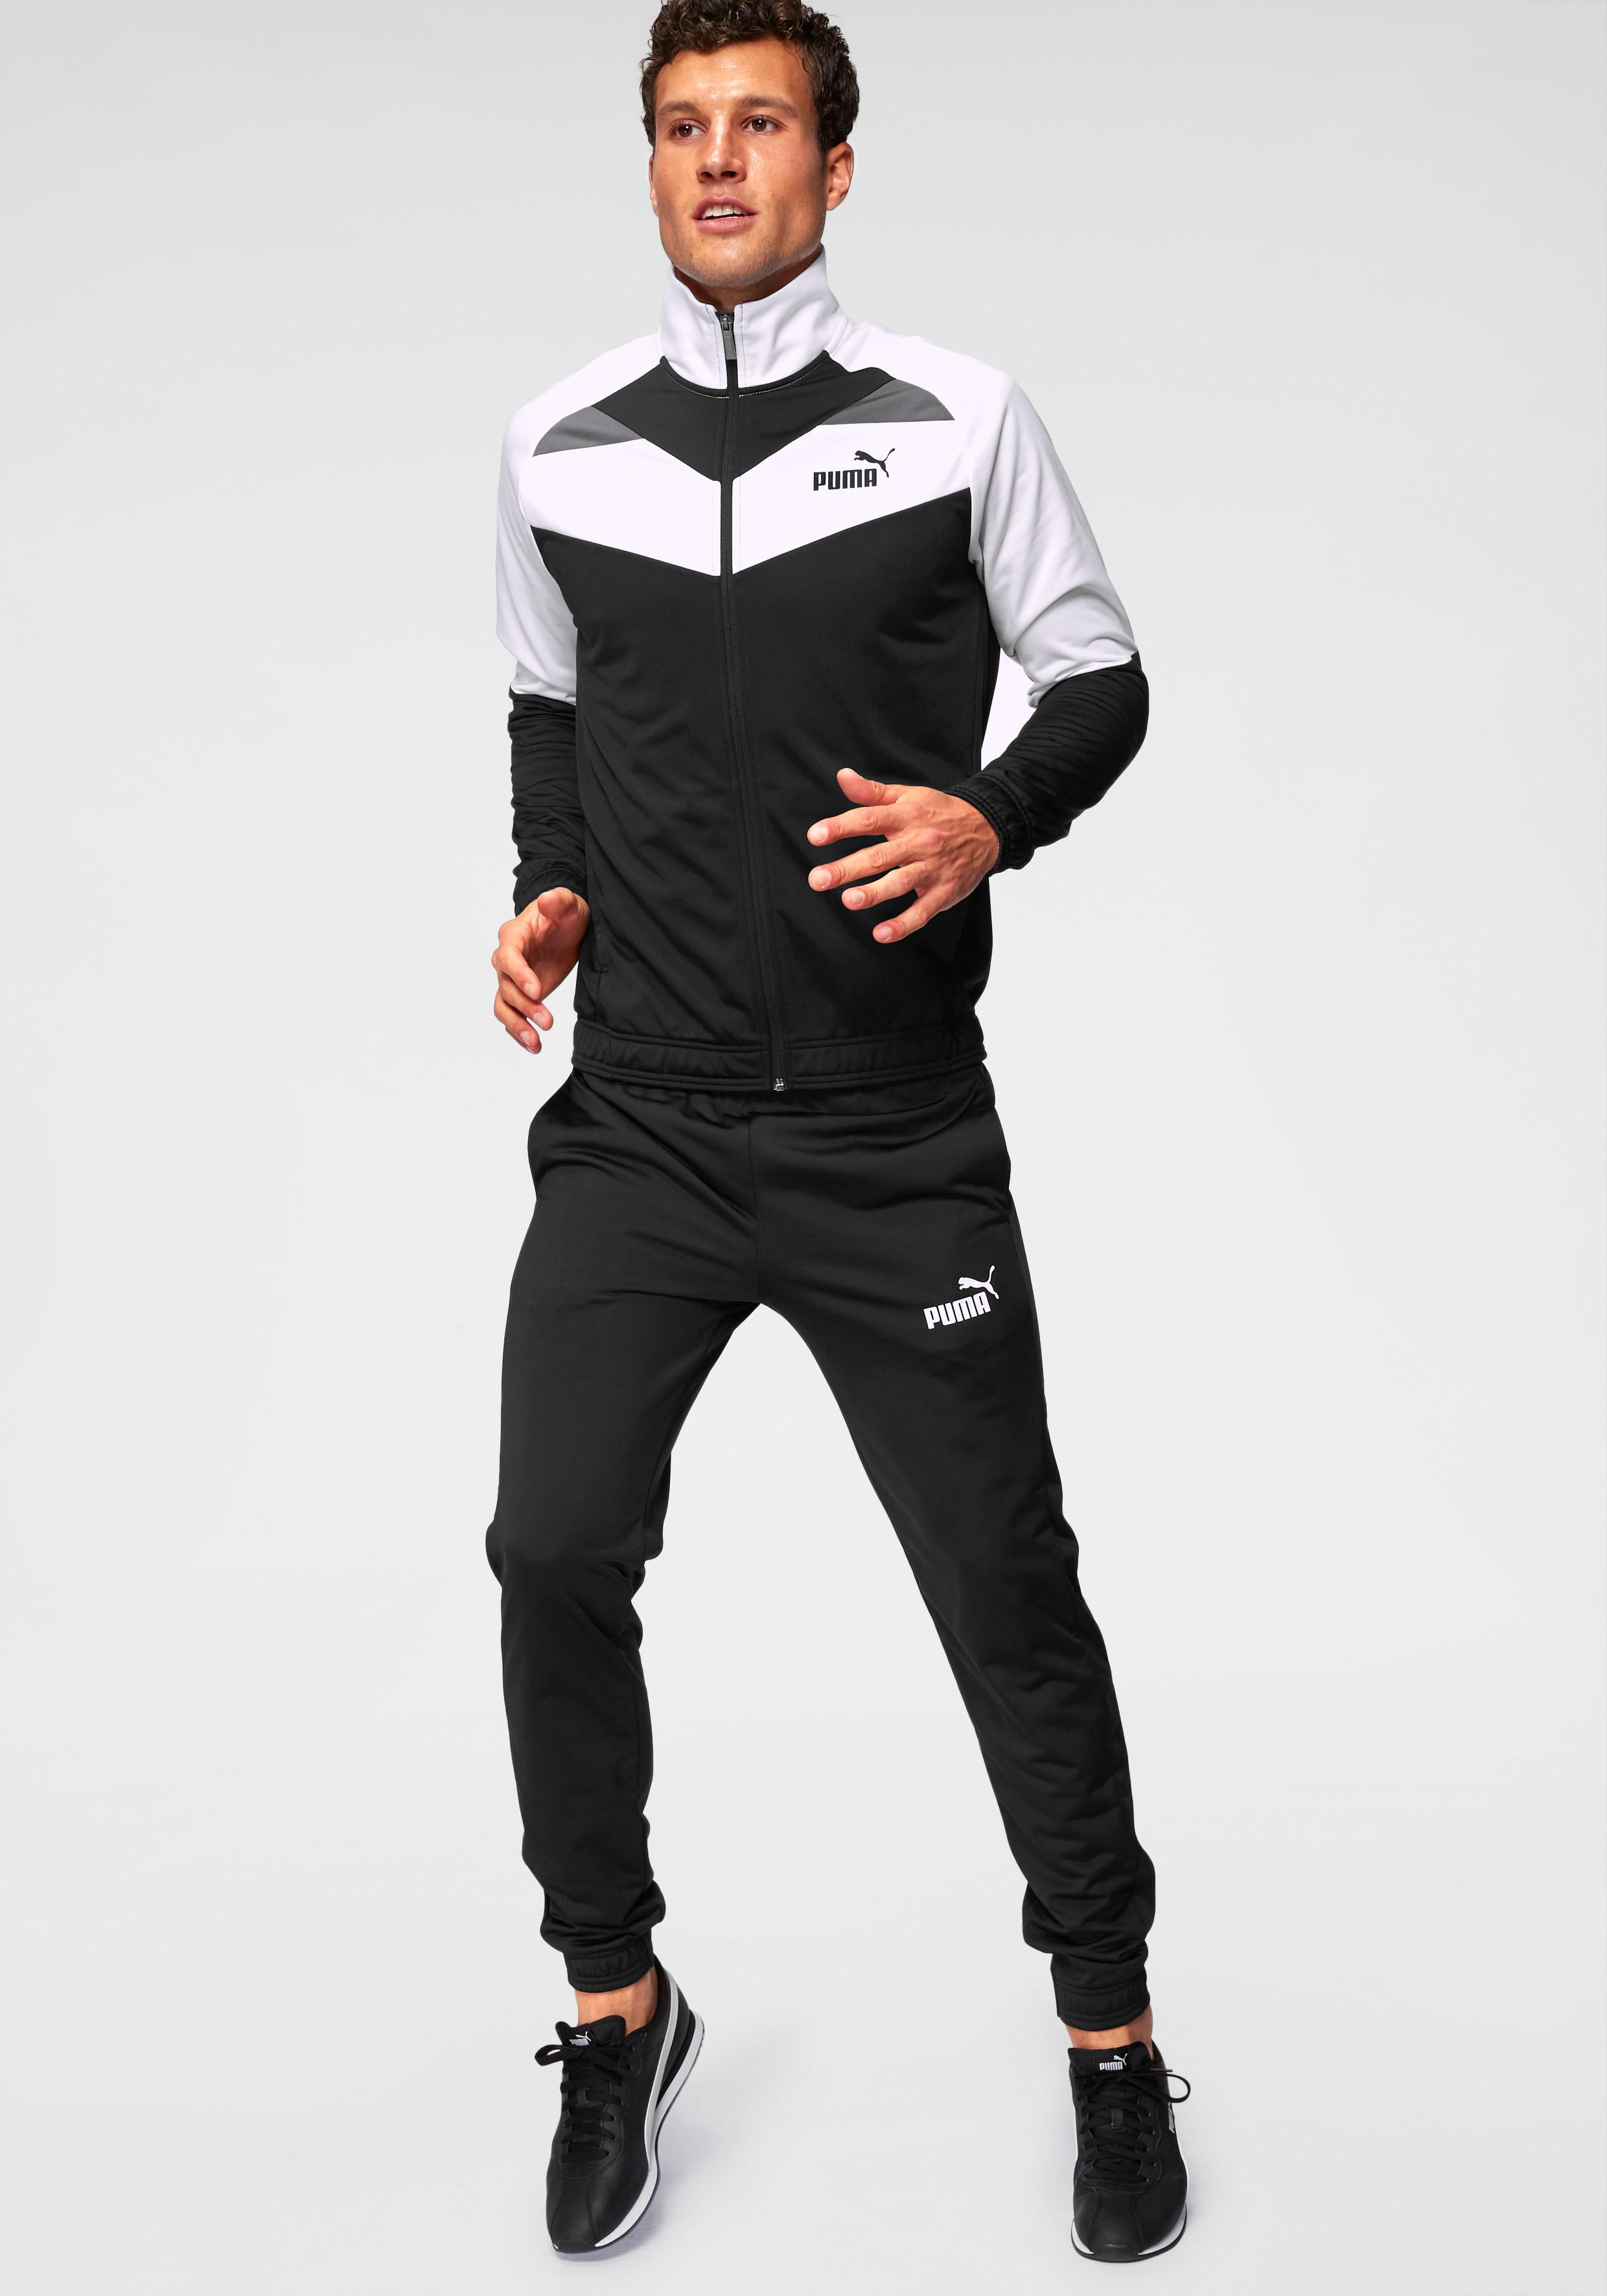 PUMA Trainingsanzug »ICONIC TRICOT SUIT Cl« | Sportbekleidung > Sportanzüge > Trainingsanzüge | Schwarz | Puma